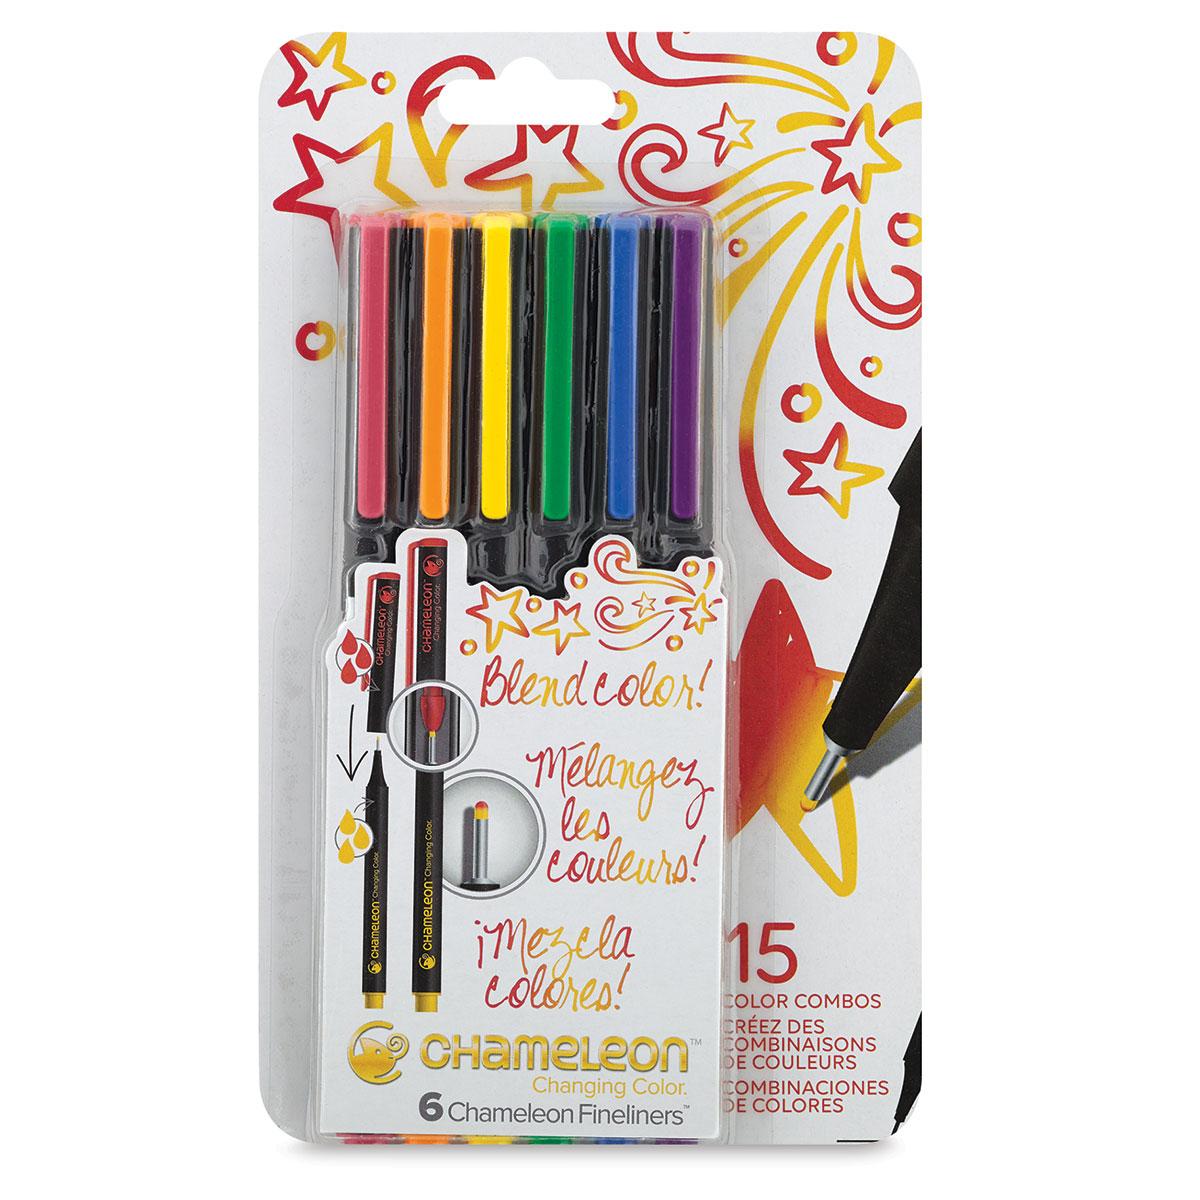 CHAMELEON Fineliner Pens 12 Assorted Bright Colours